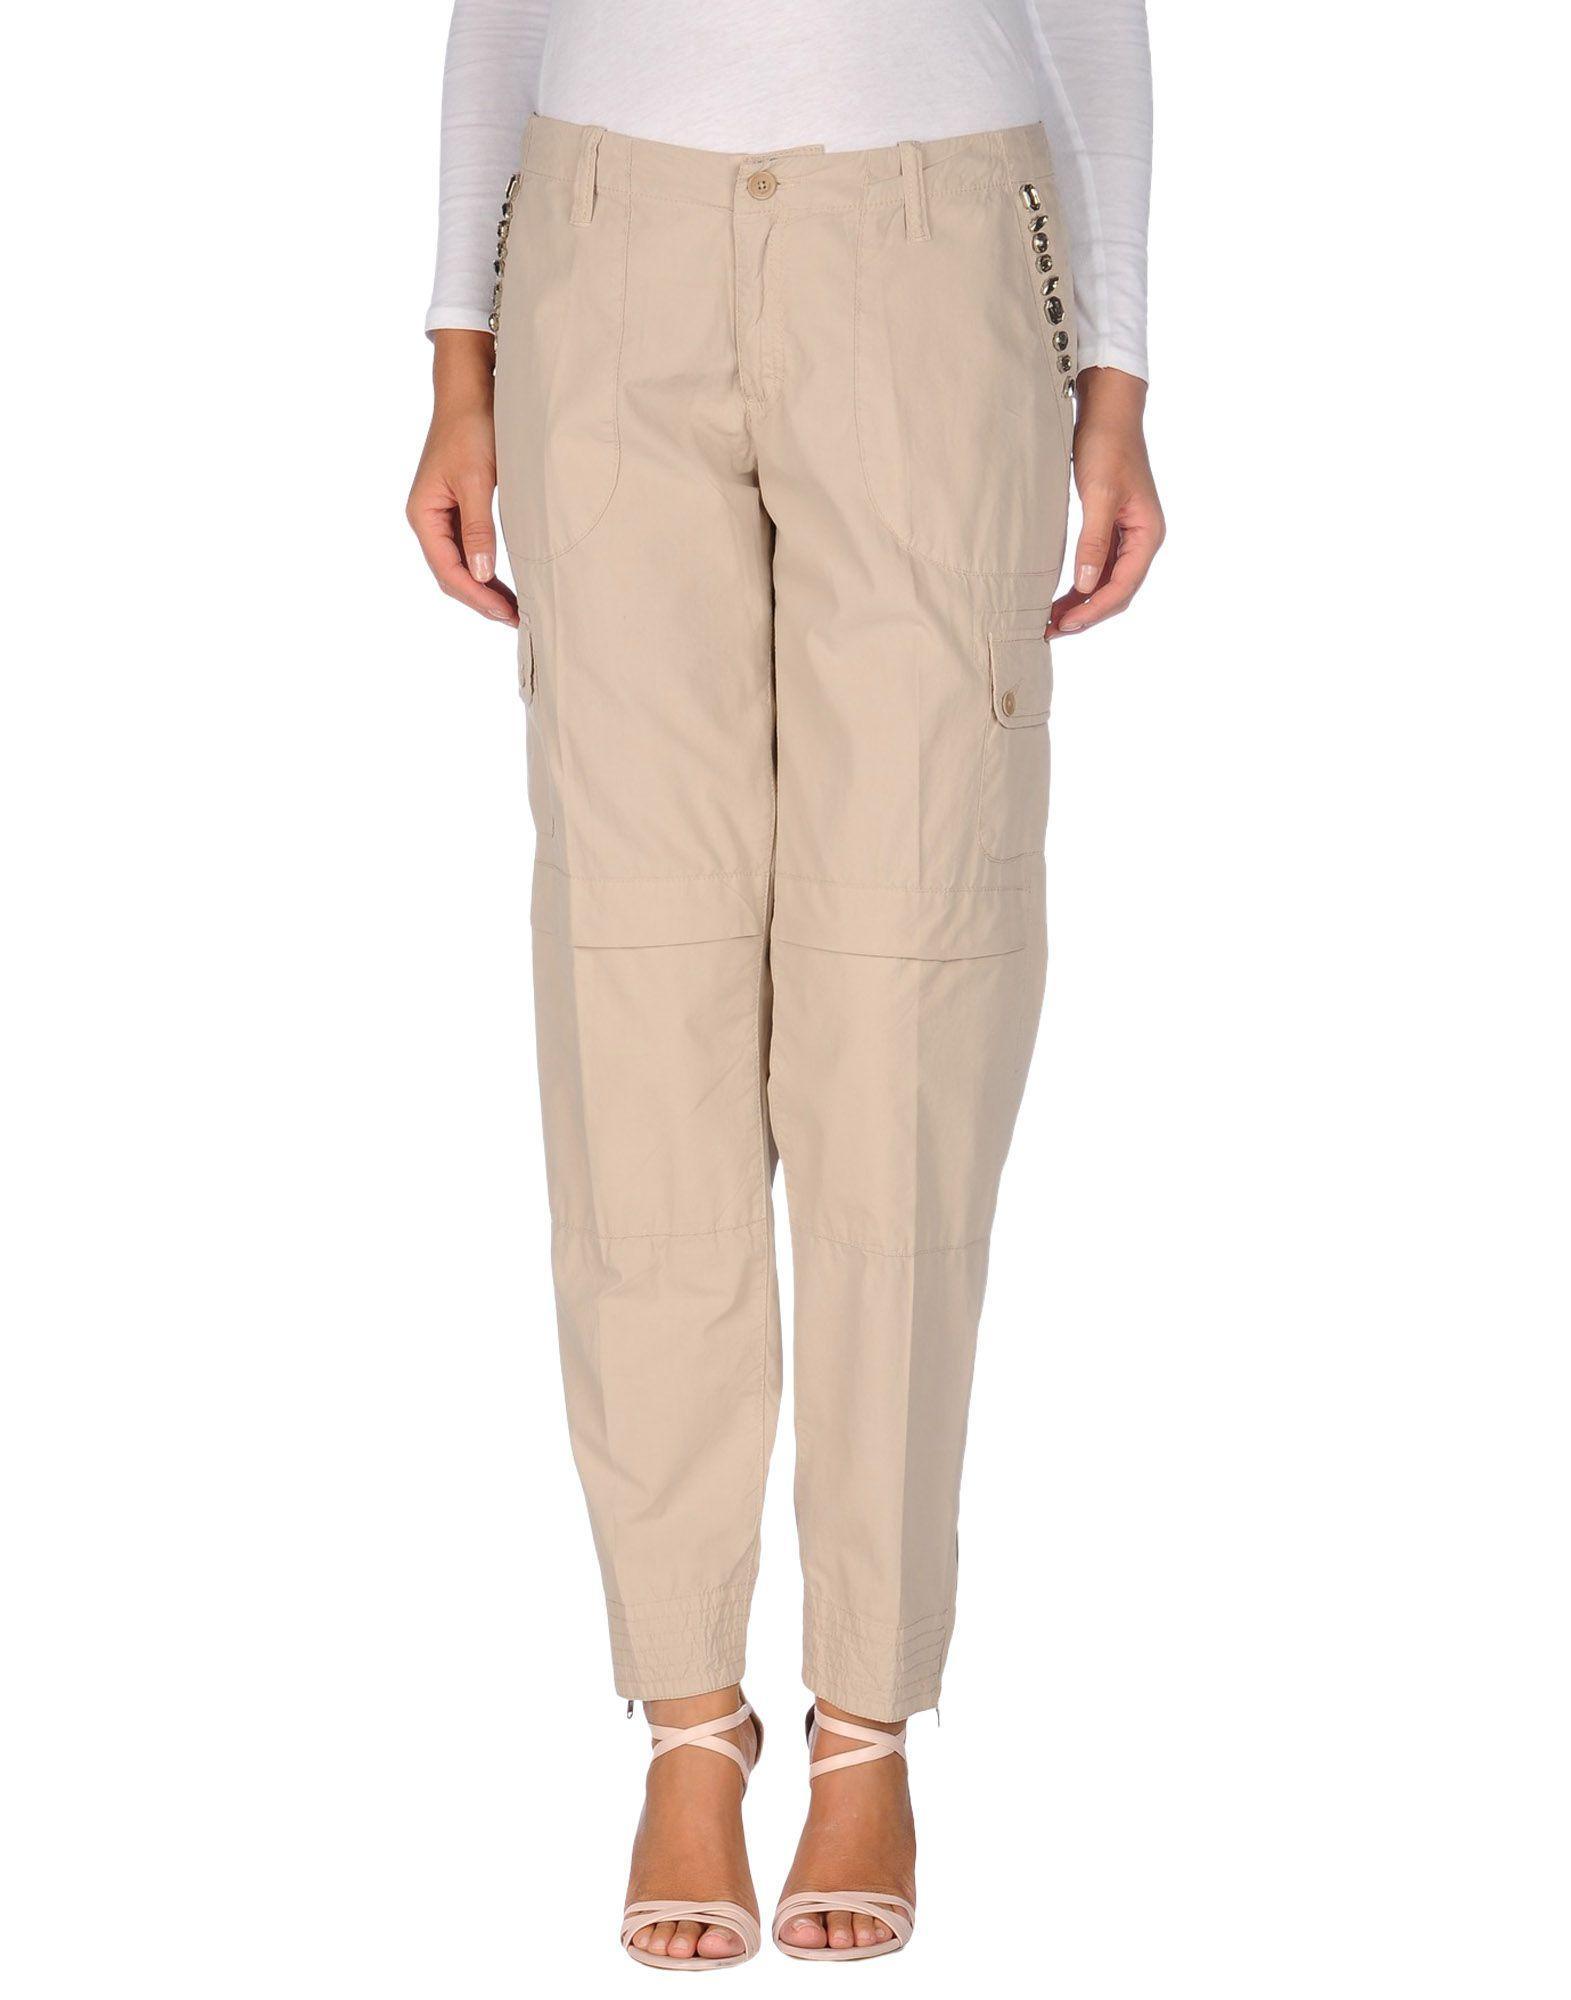 Liu •jo Casual Pants In Light Grey